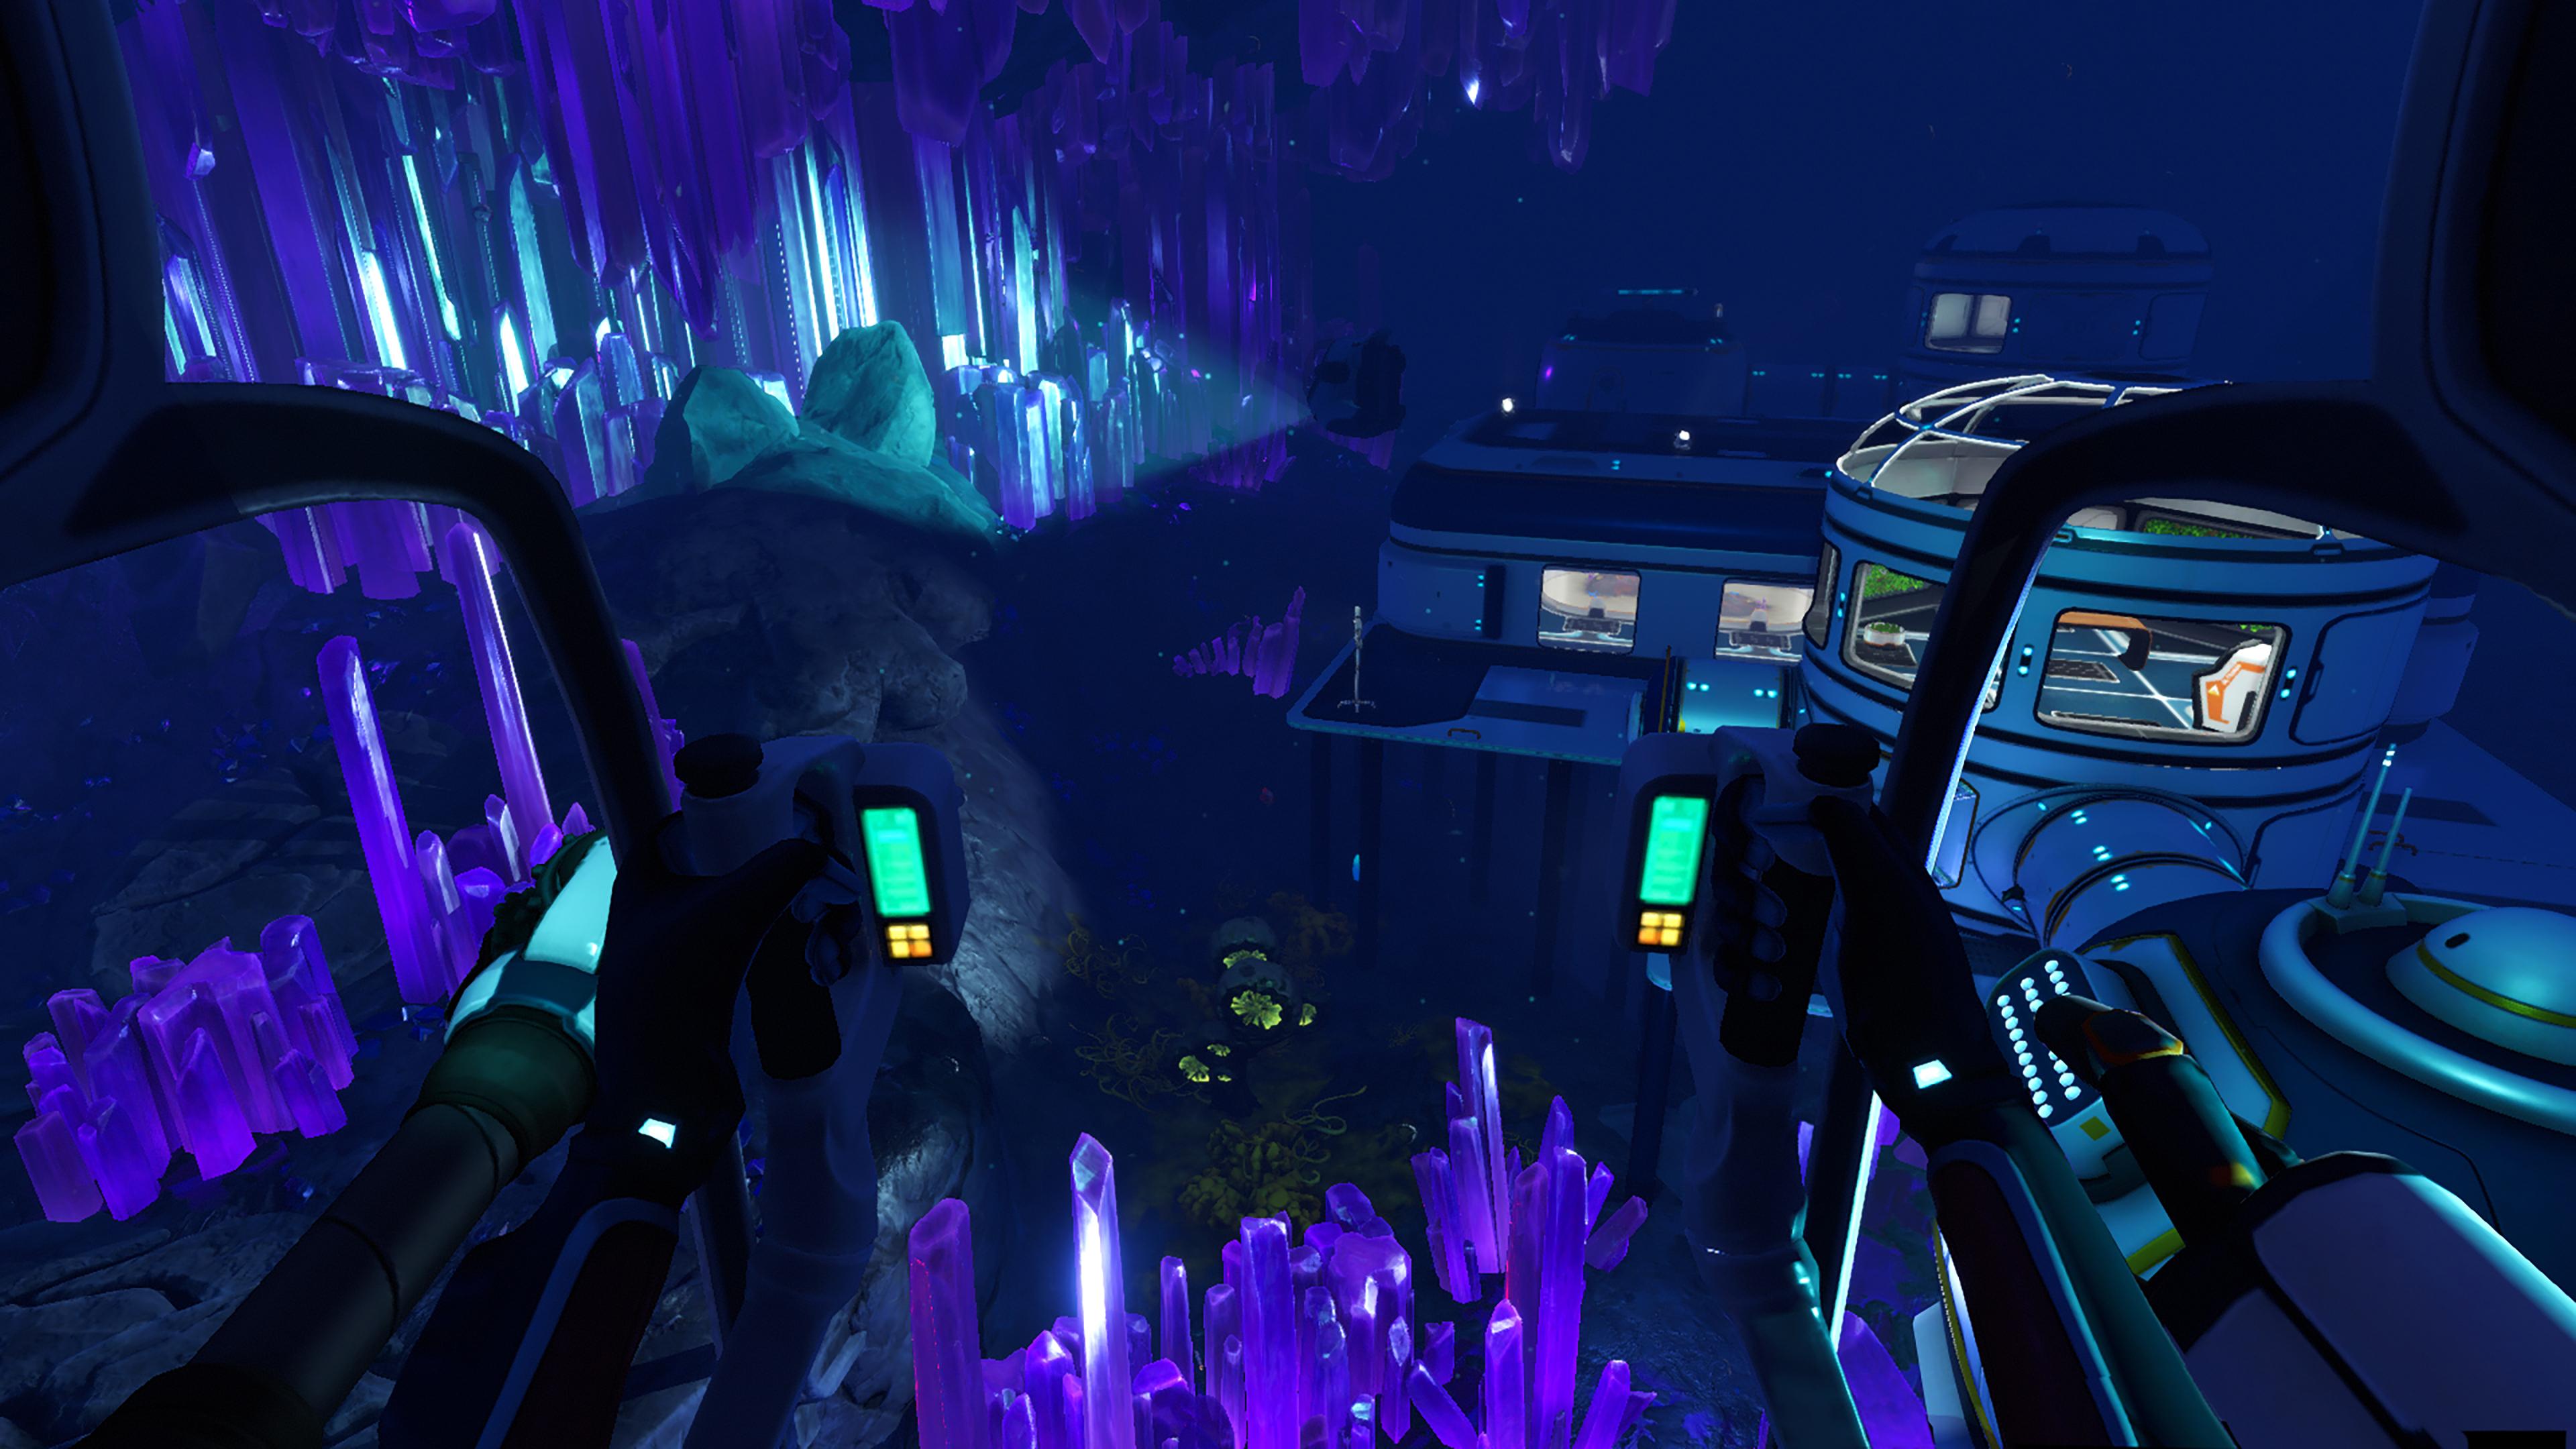 Скриншот №1 к Subnautica Below Zero PS4 and PS5